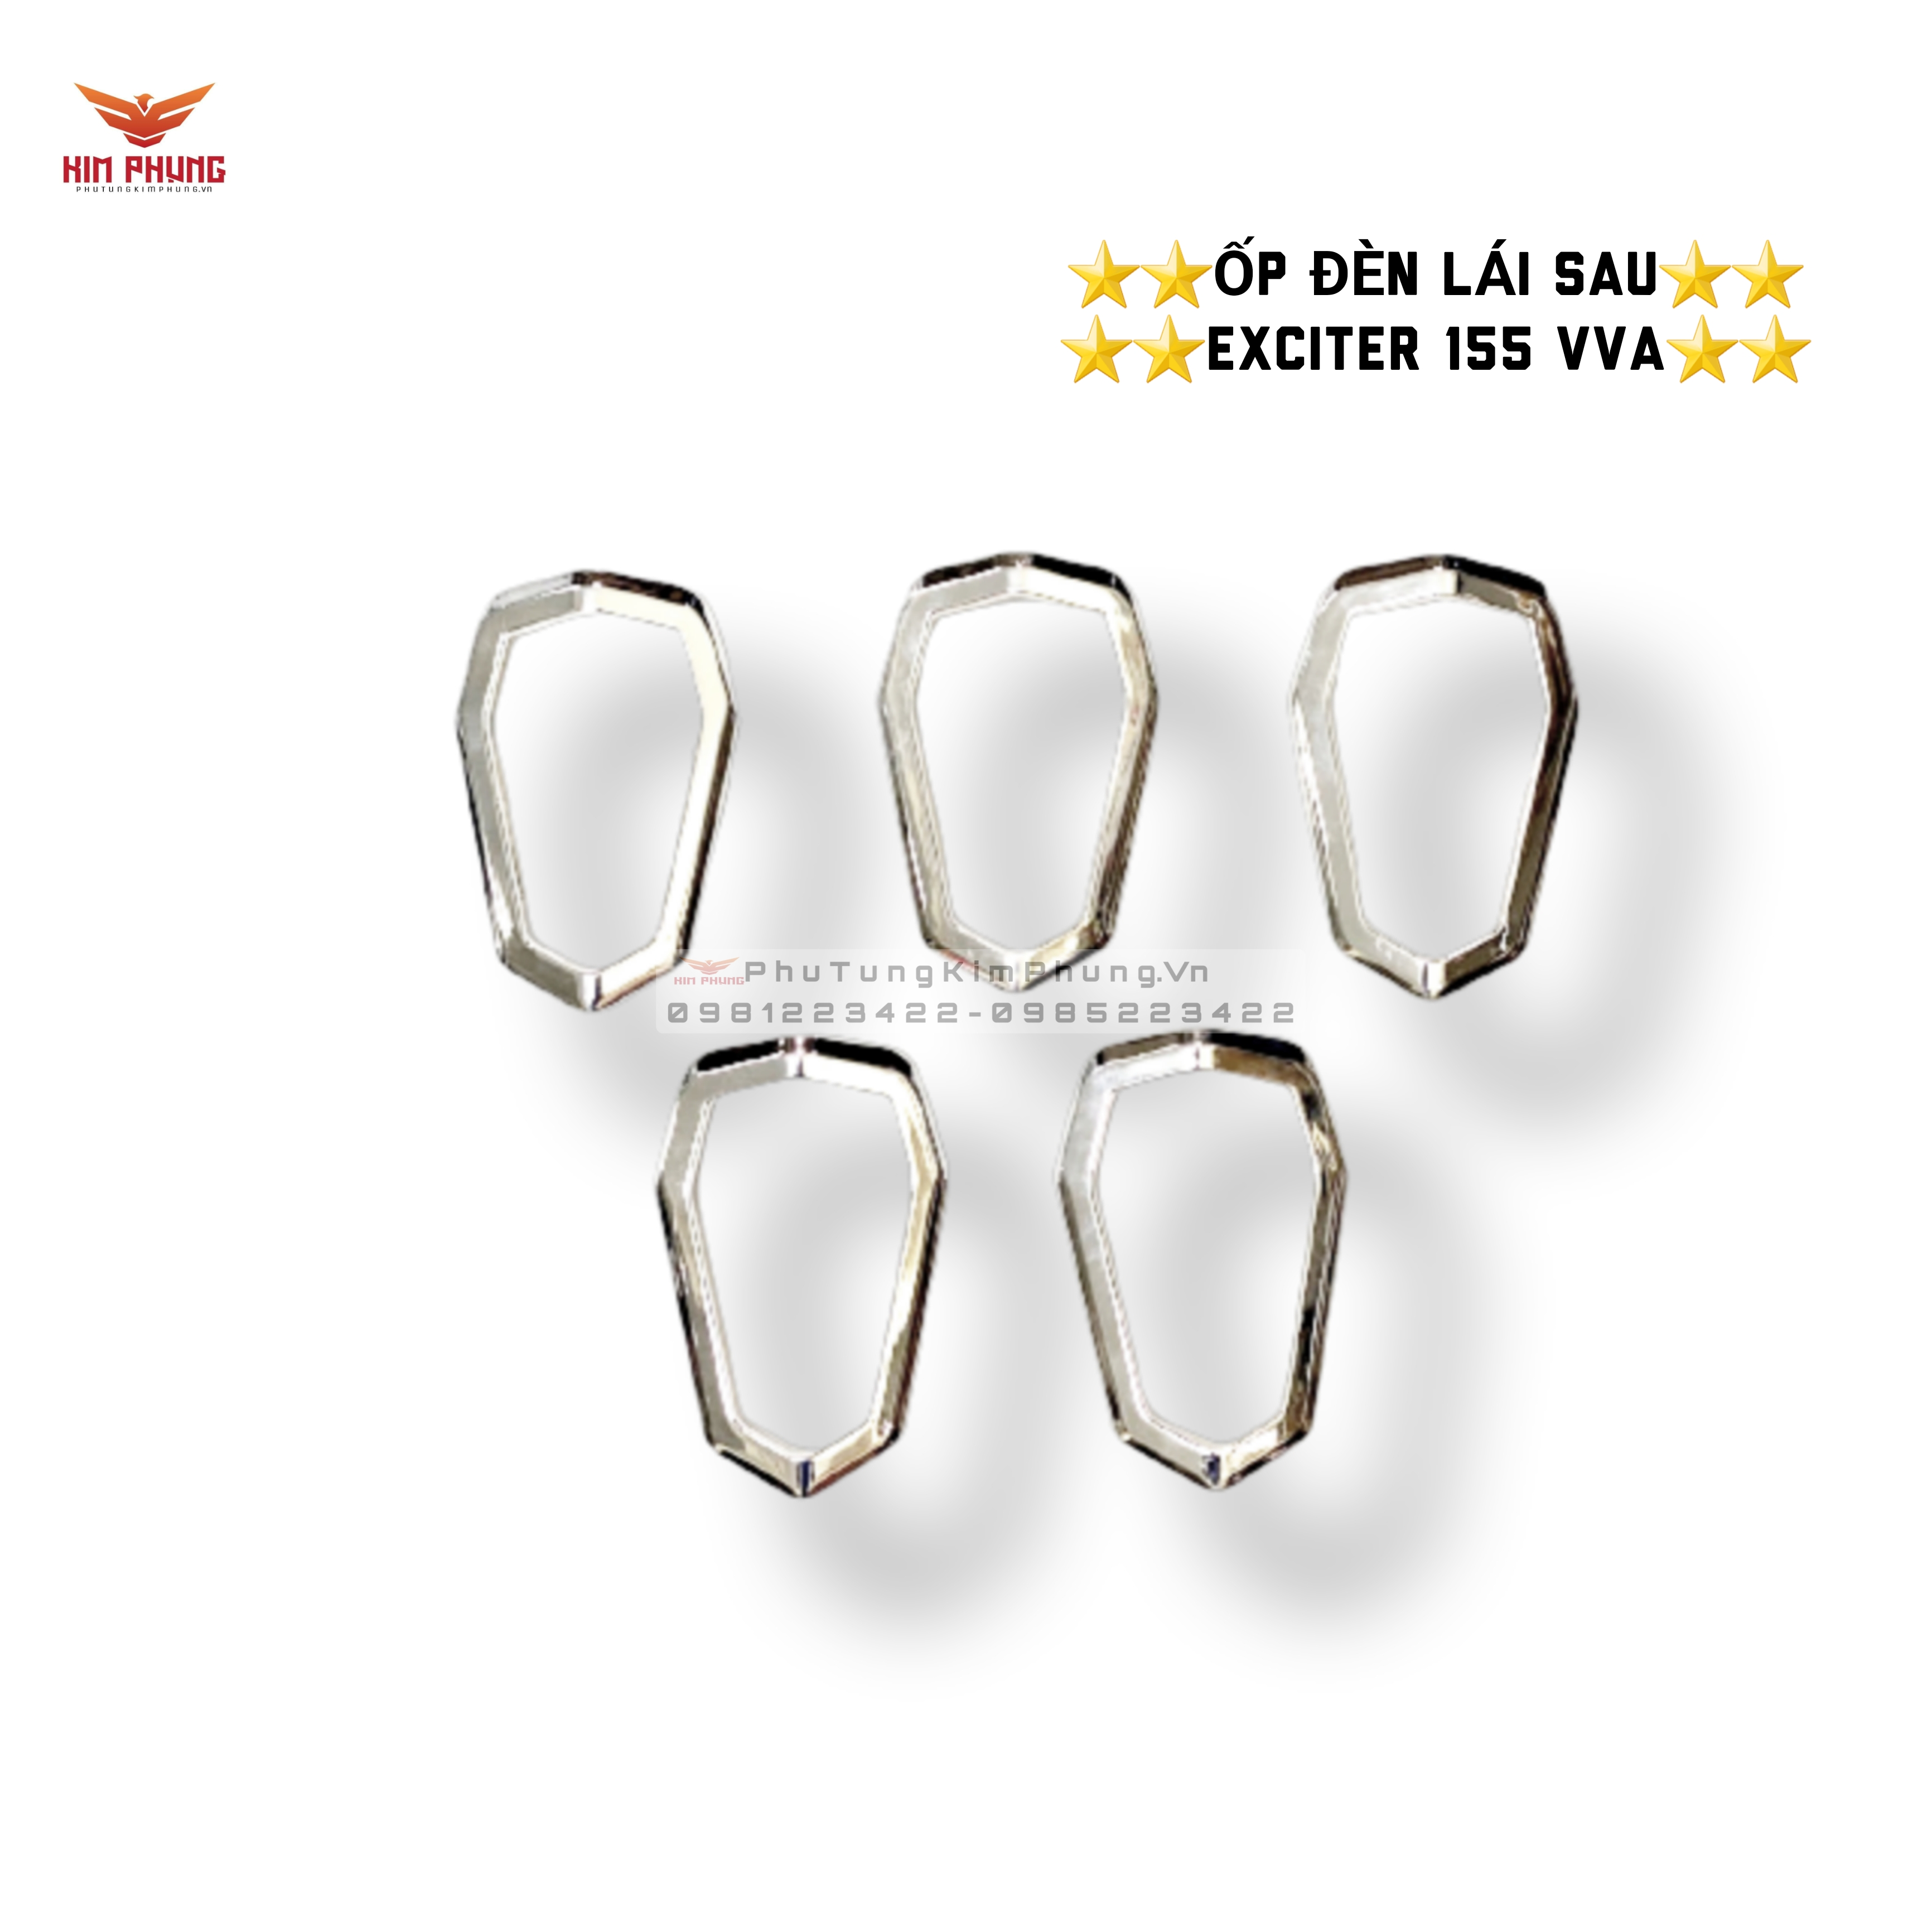 ỐP ĐÈN LÁI SAU EXCITER 155 VVA